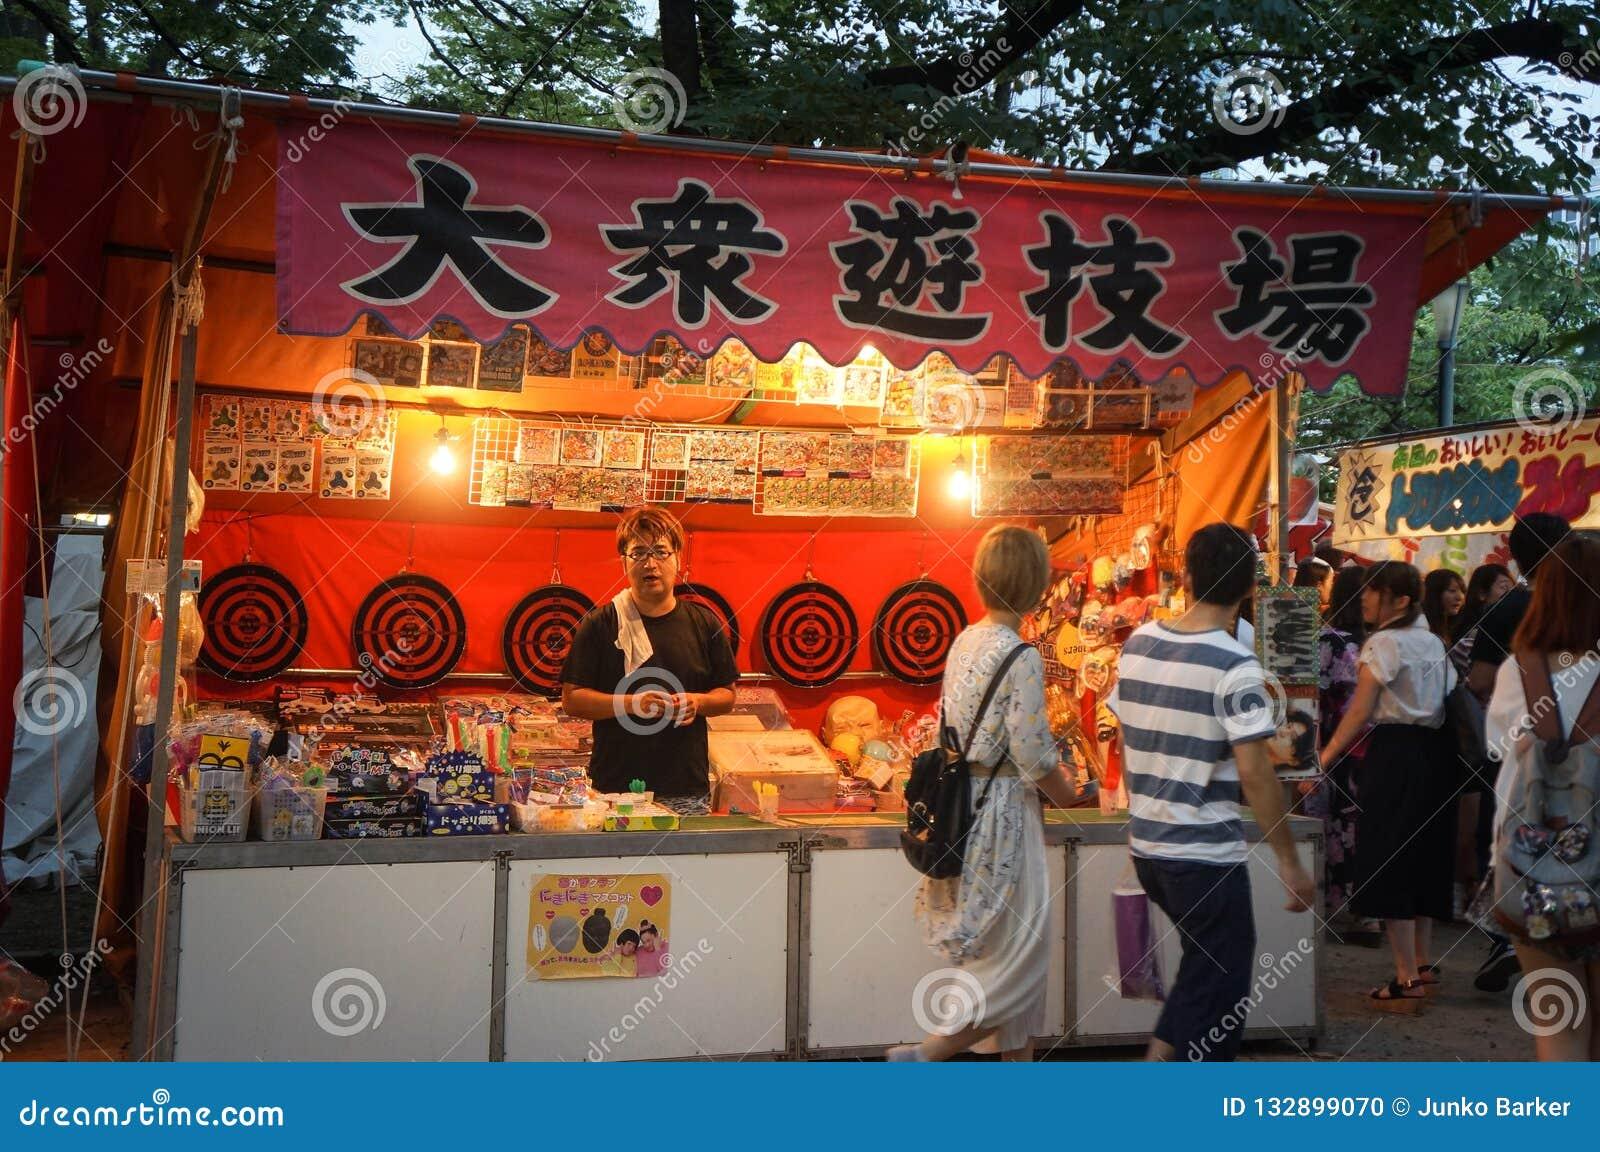 Tenjin Festival, Osaka, Japan Editorial Image - Image of asian, 23rd